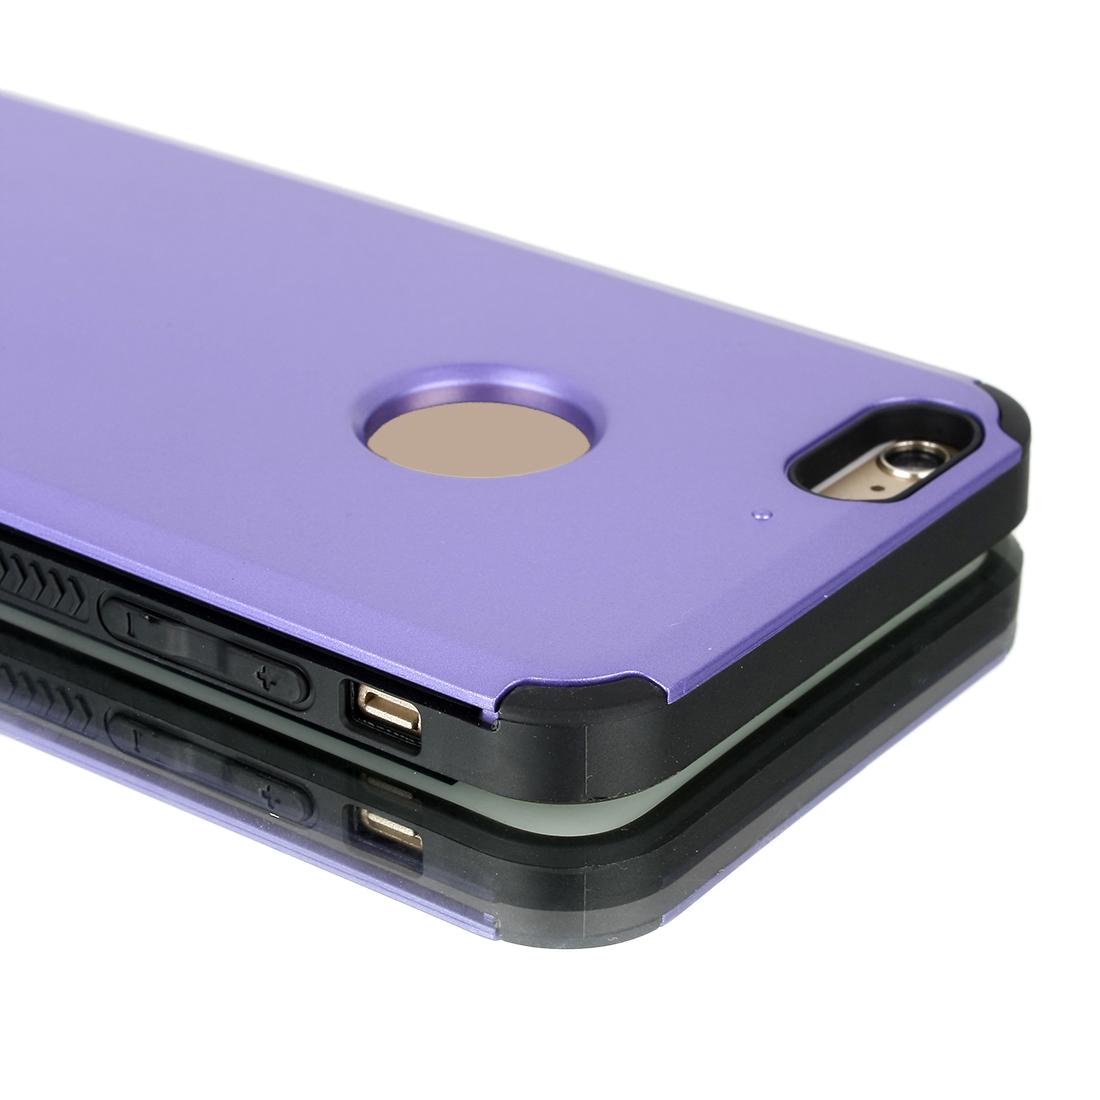 "Card Pocket ShockProof Slim Hybrid Wallet Case Cover Purple for iPhone 6 Plus 5.5"""